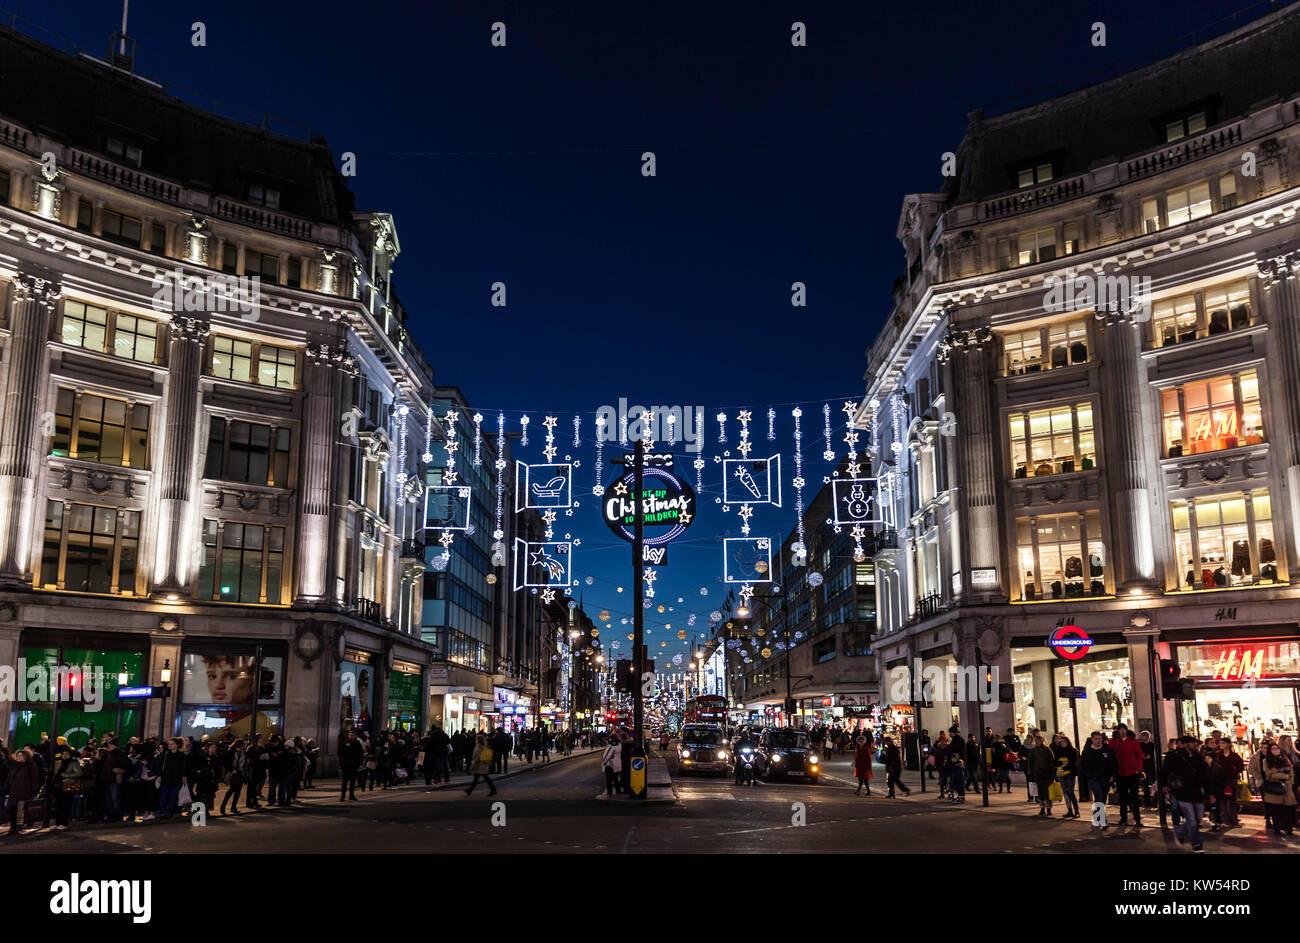 Decorazioni Natalizie Londra.Oxford Street Luci E Decorazioni Natalizie Londra Inghilterra